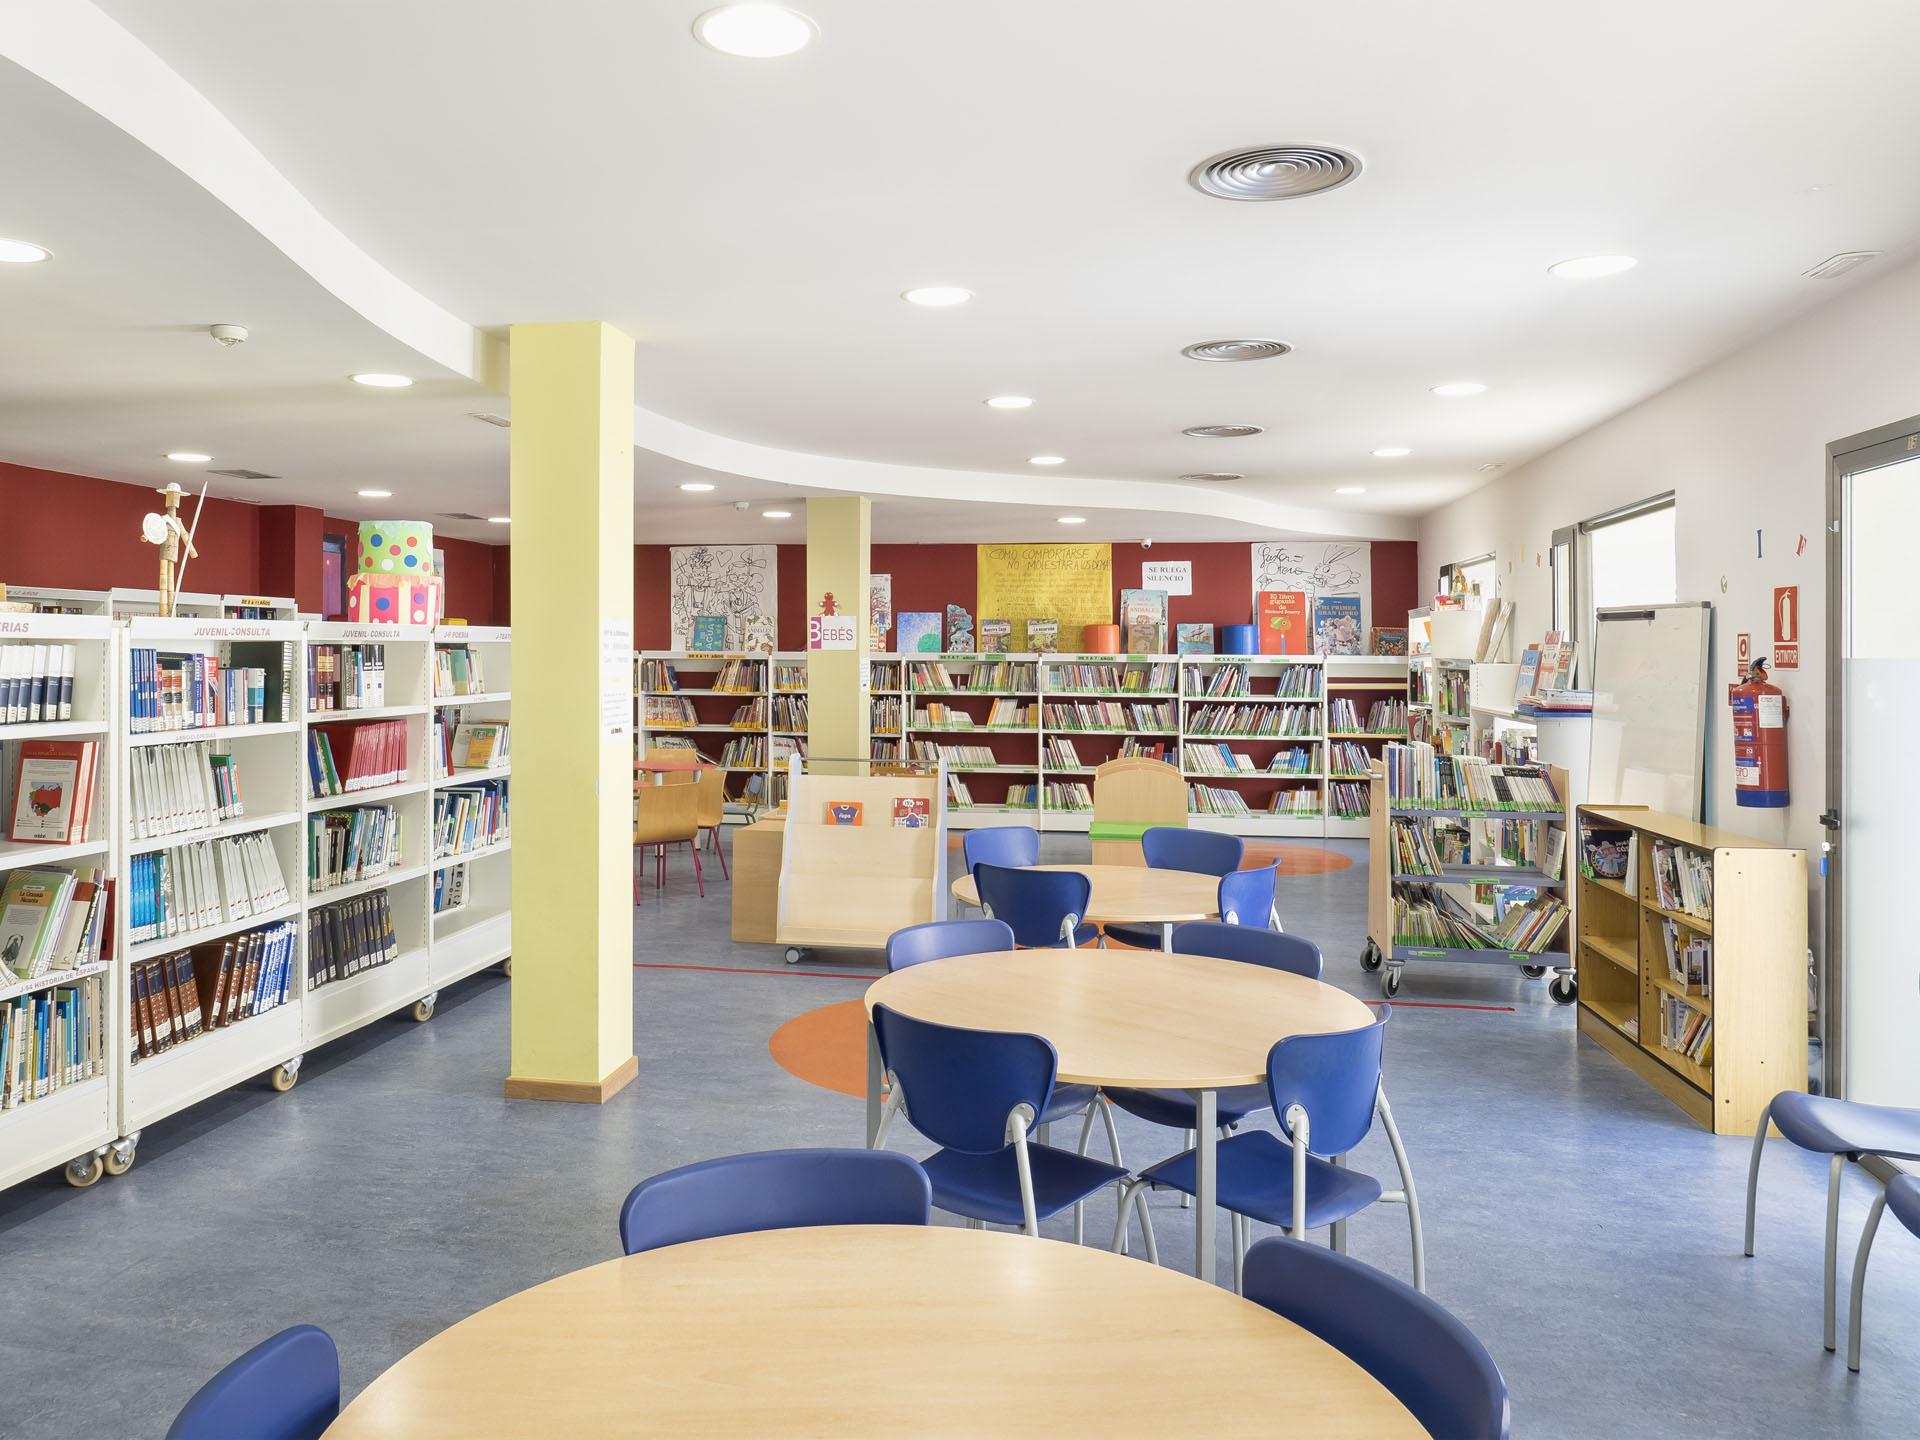 OUC biblioteca Tudela de Duero D